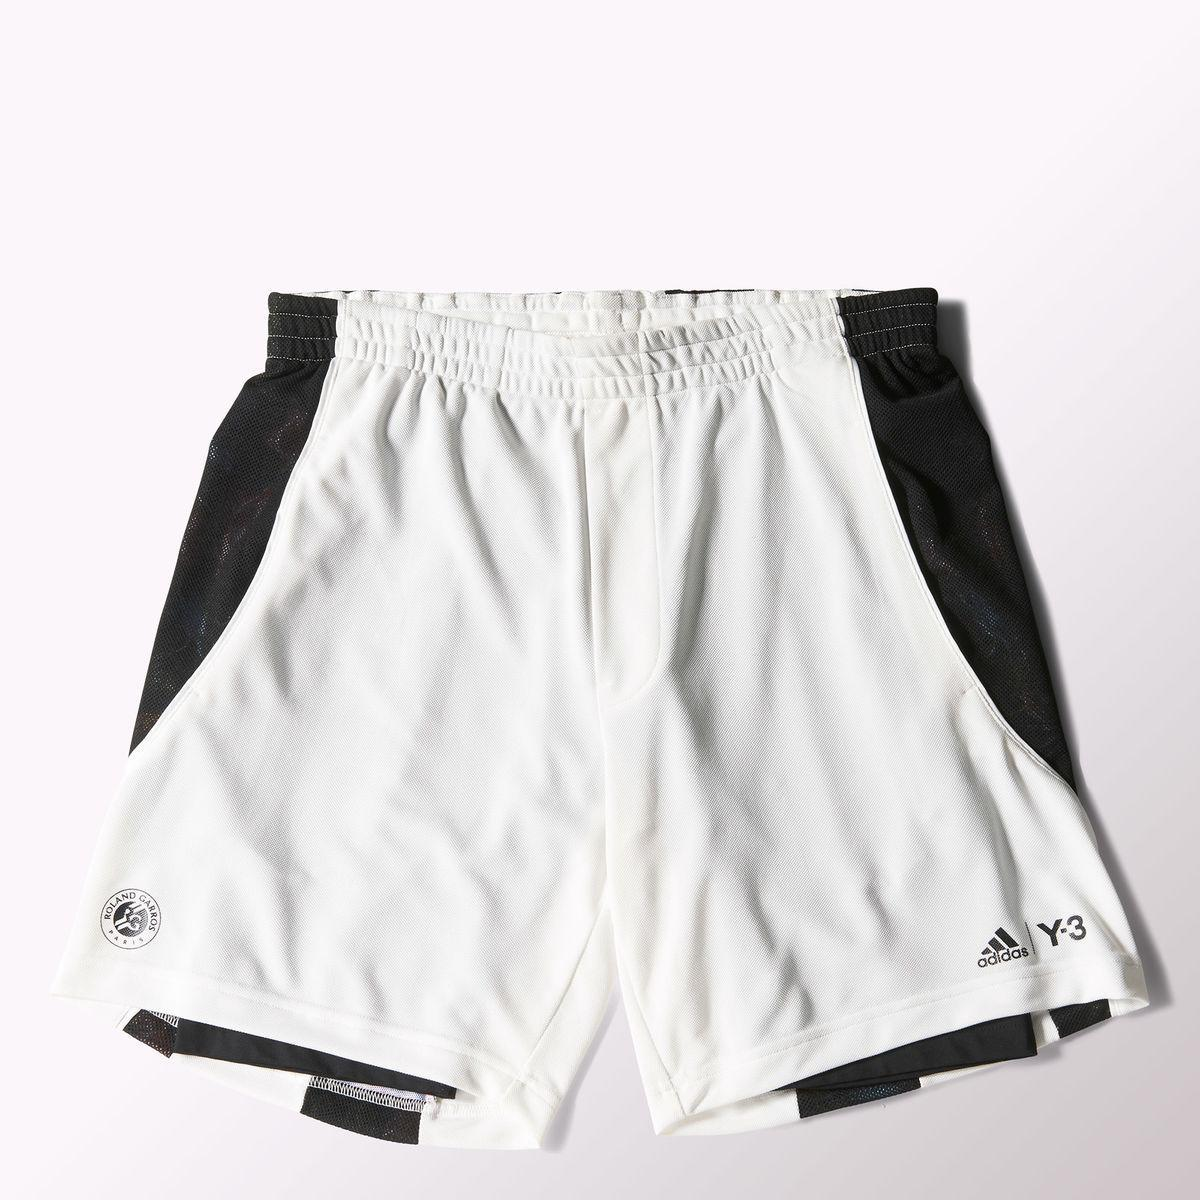 91d258983 Adidas Mens Y-3 Roland Garros Shorts - White - Tennisnuts.com